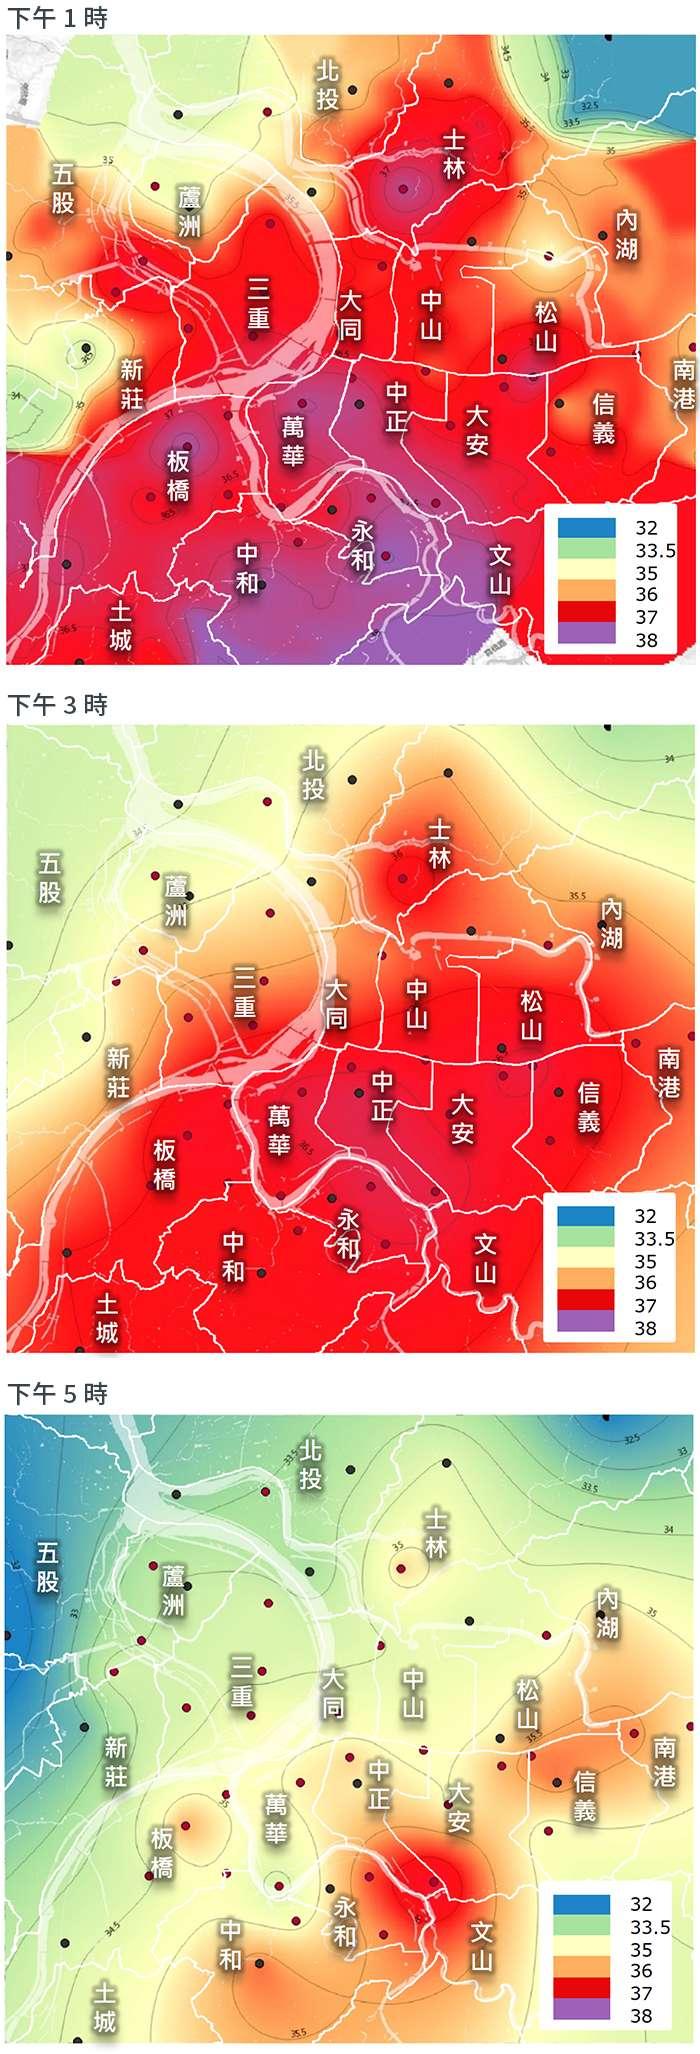 20200906-SMG0034-E01a-台北市氣溫圖